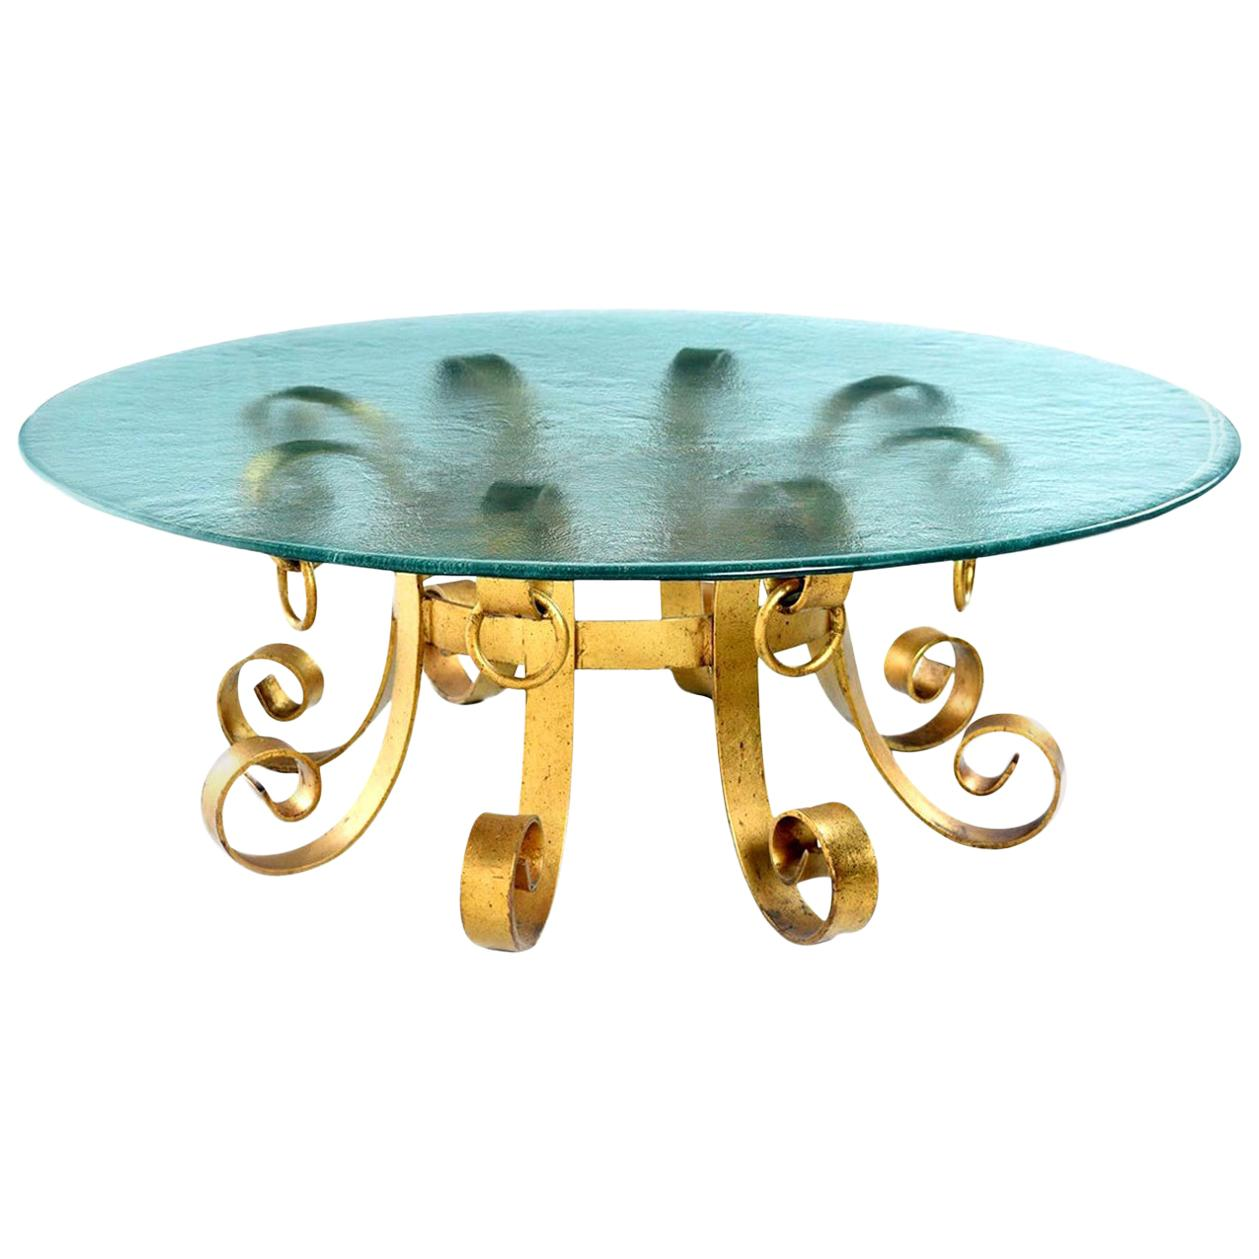 Hollywood Regency Gilt Iron Scroll Knocker Rippled Glass Top Coffee Table